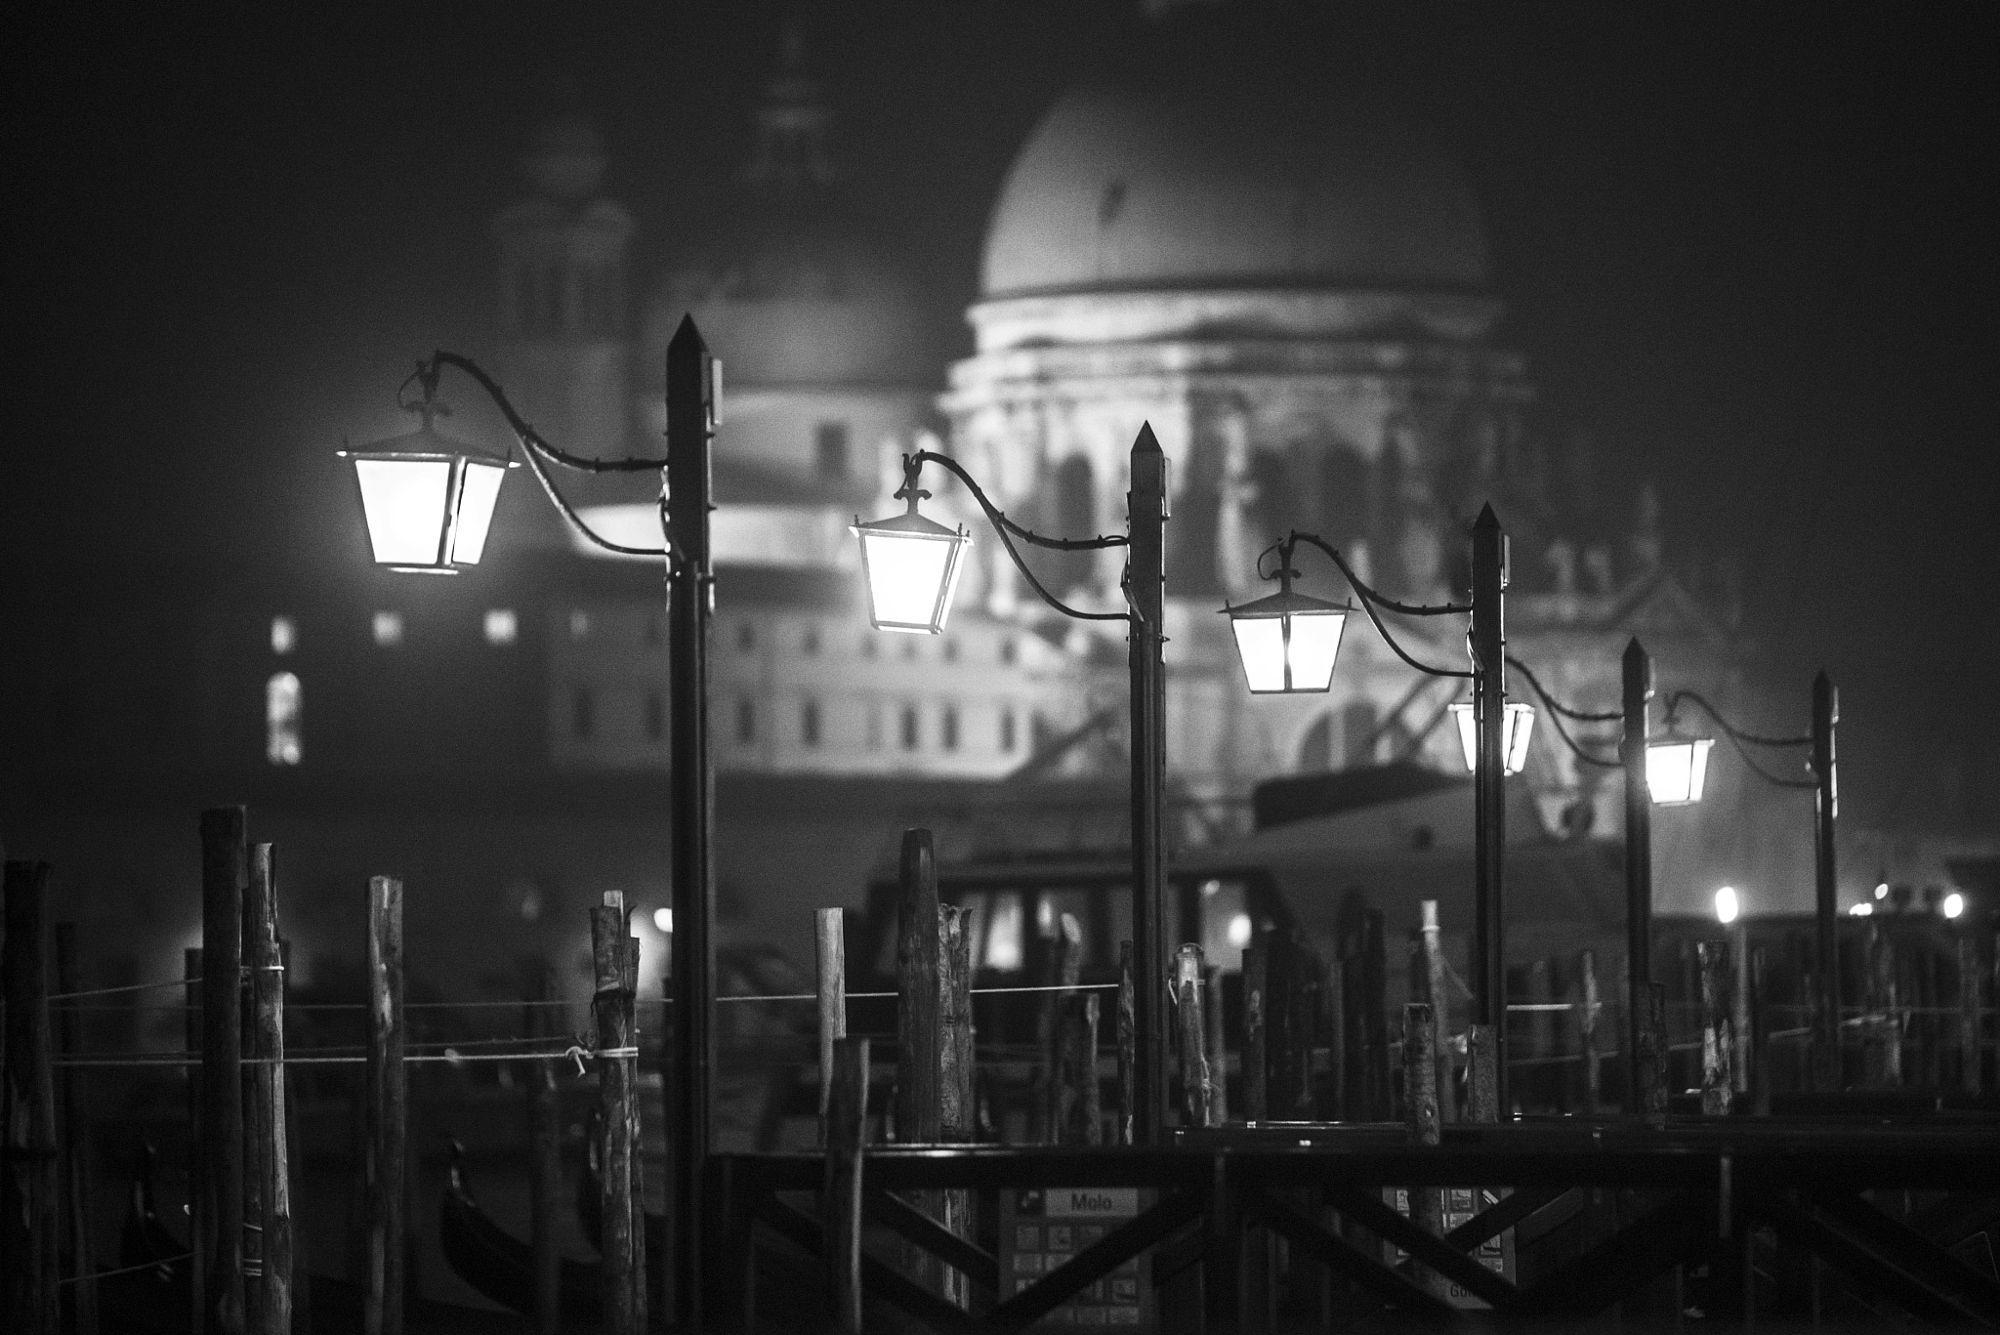 Venice the dark - Venice late night nobody is going around mystical...